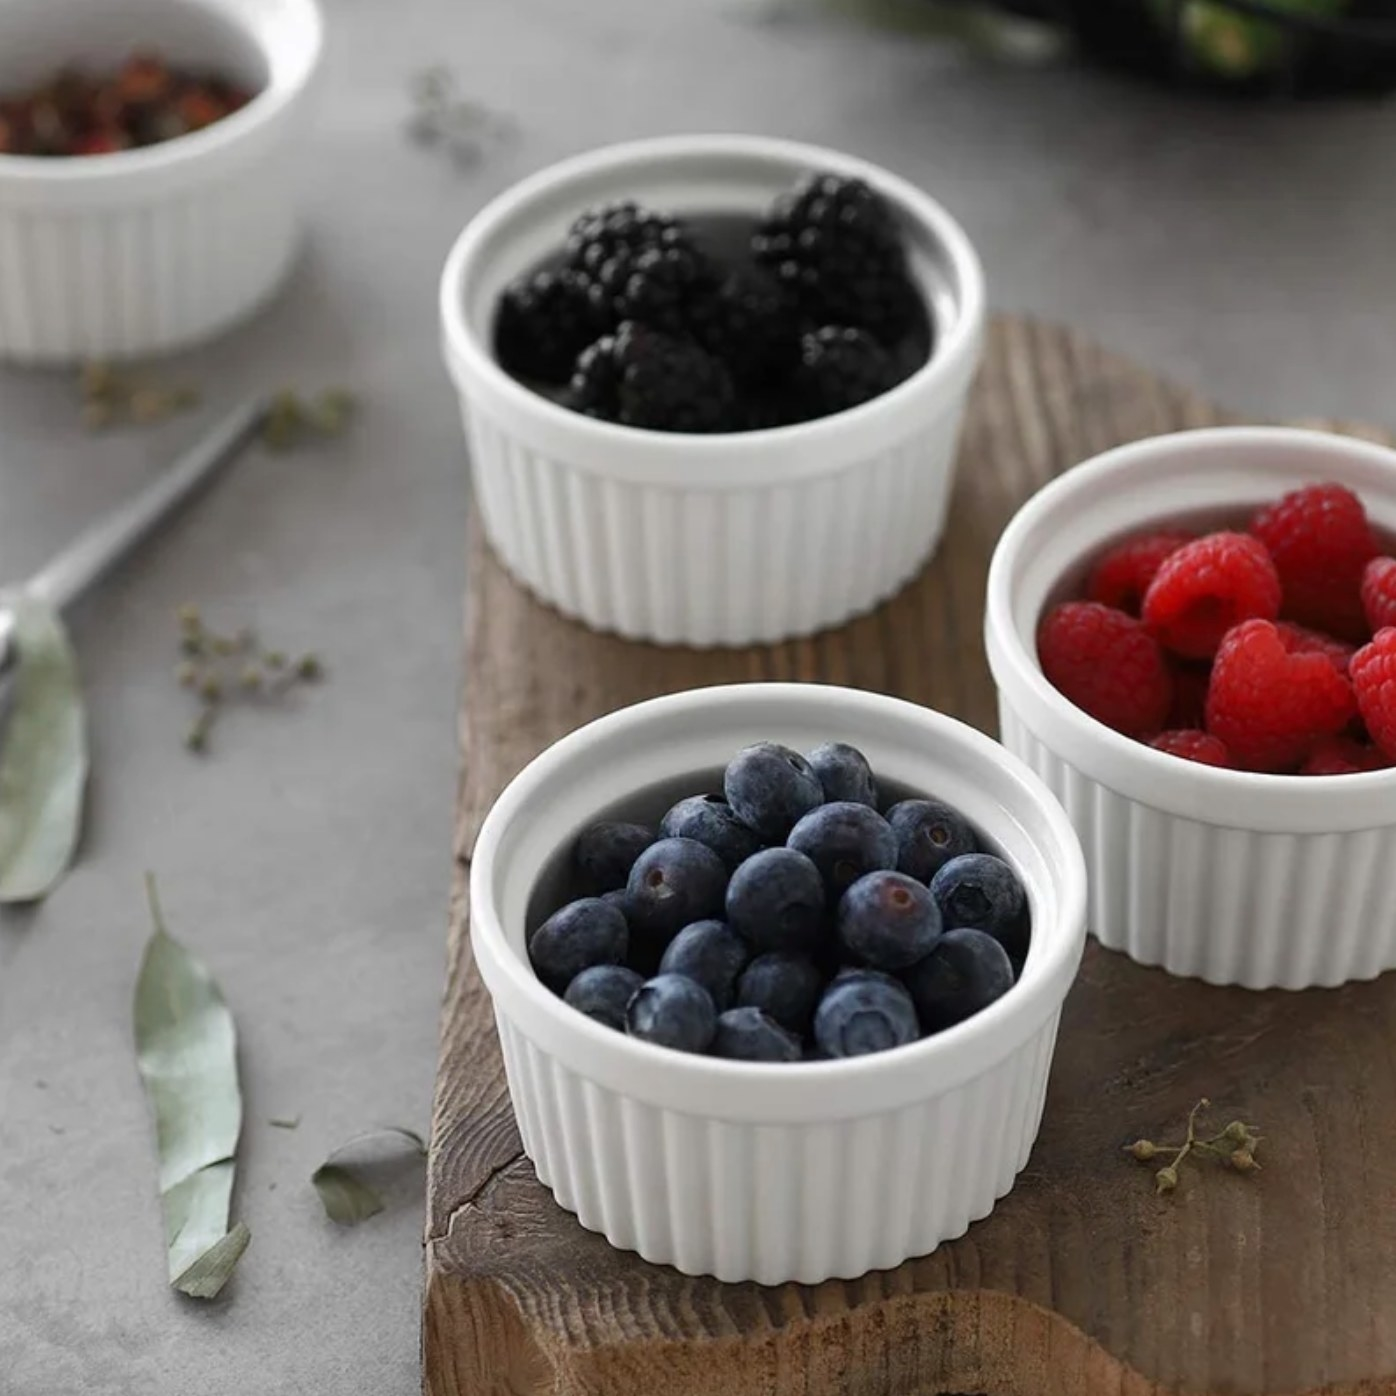 The set of six ramekins in white holding berries